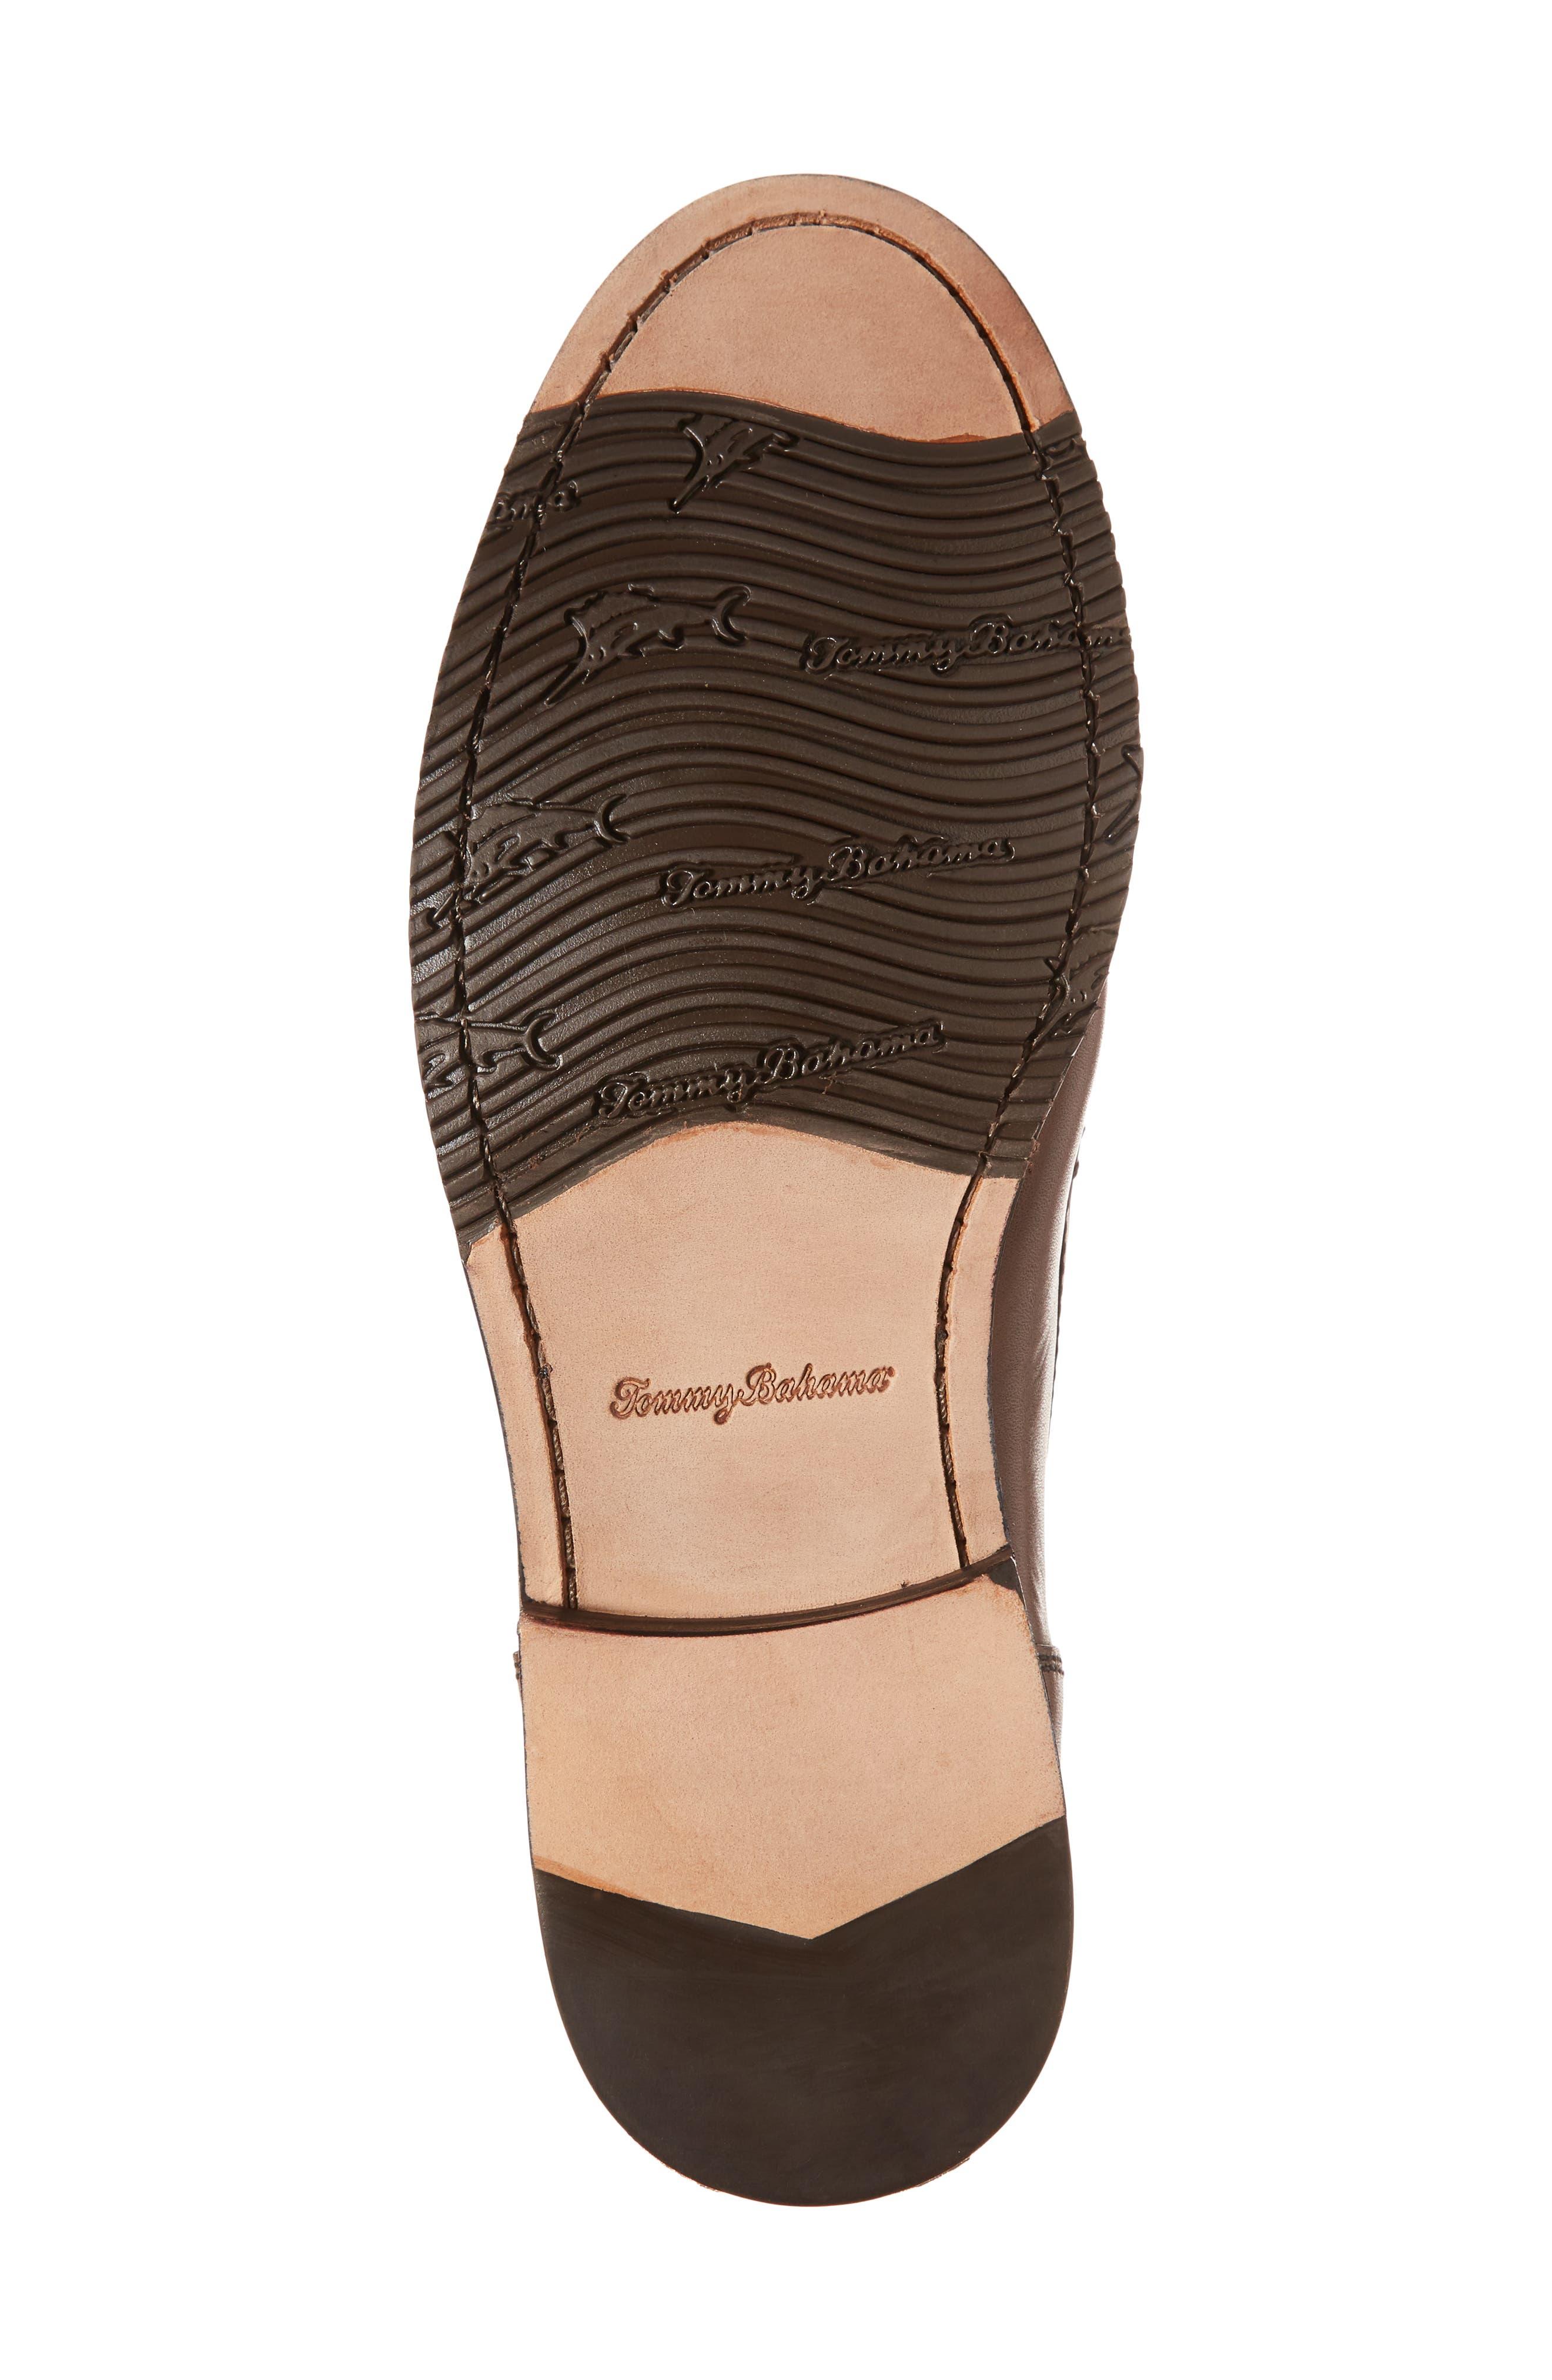 Maya Bay Bit Loafer,                             Alternate thumbnail 6, color,                             Brown Leather